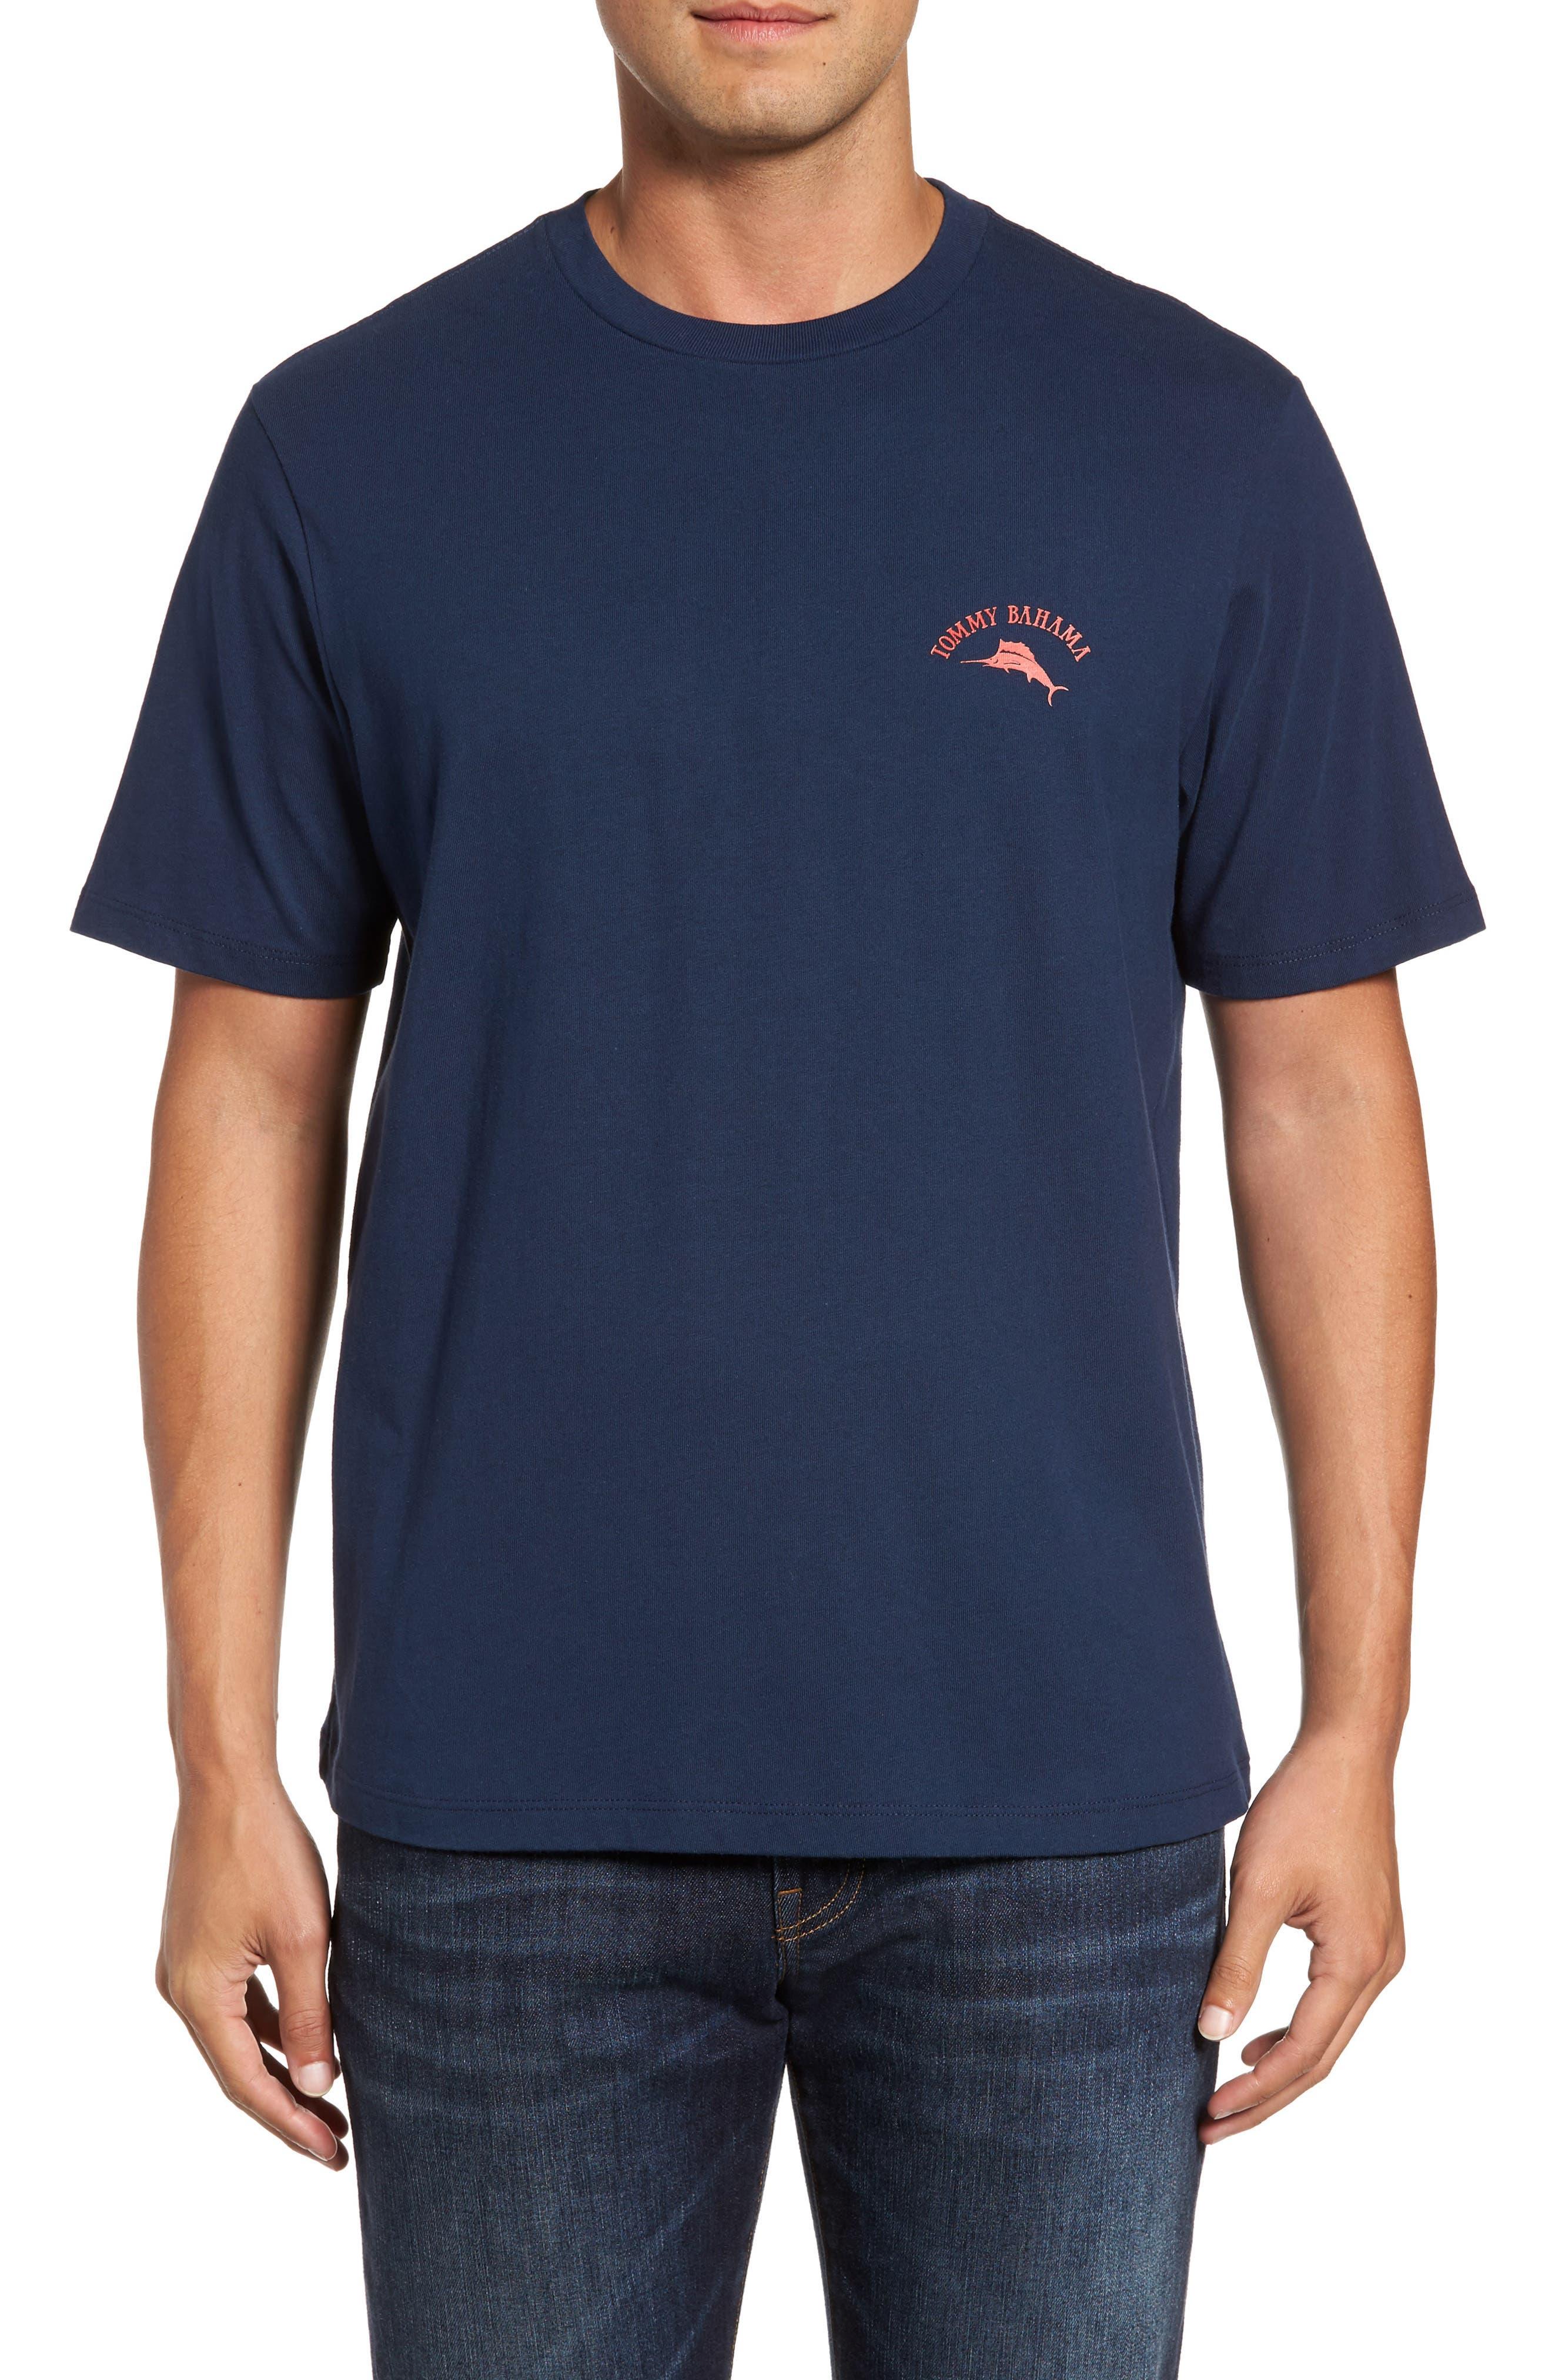 Big Boats Standard Fit T-Shirt,                             Main thumbnail 1, color,                             401